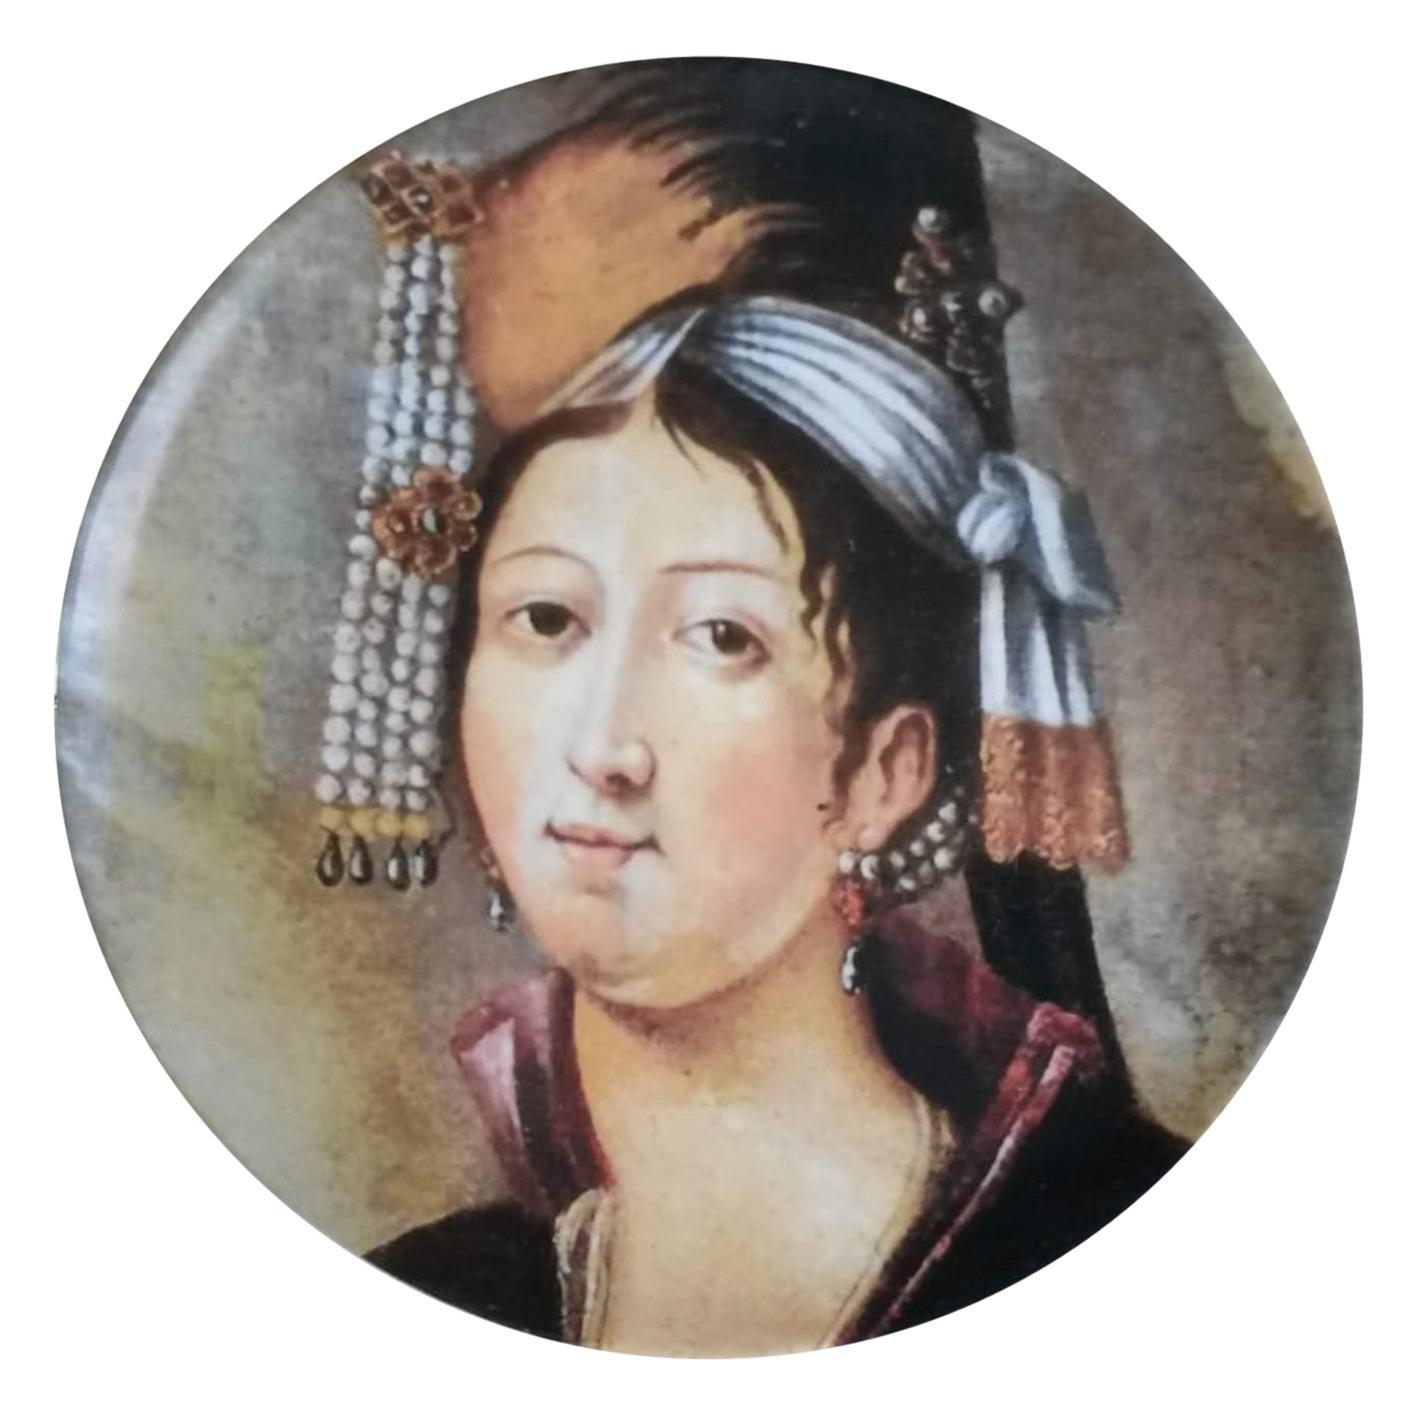 Handmade Ottoman Woman Porcelain Plate